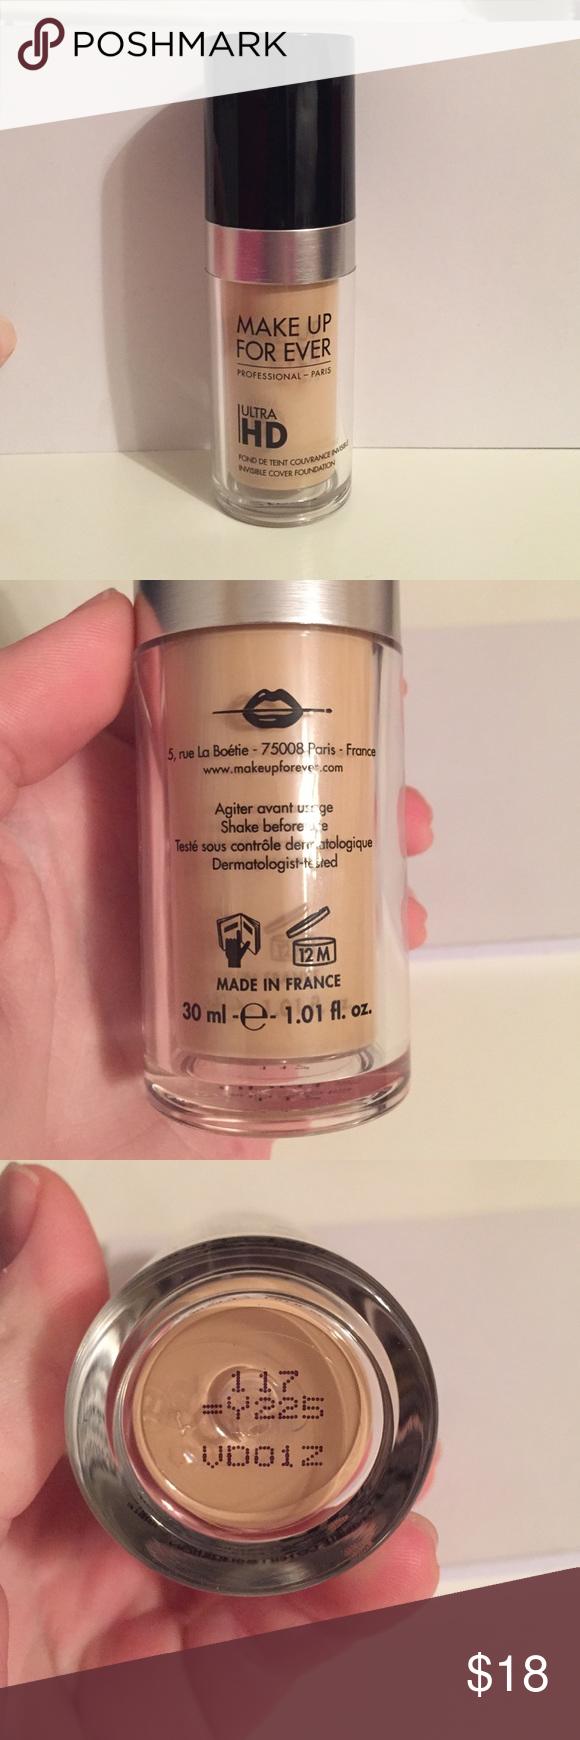 Makeup forever ultra HD foundation Makeup forever ultra